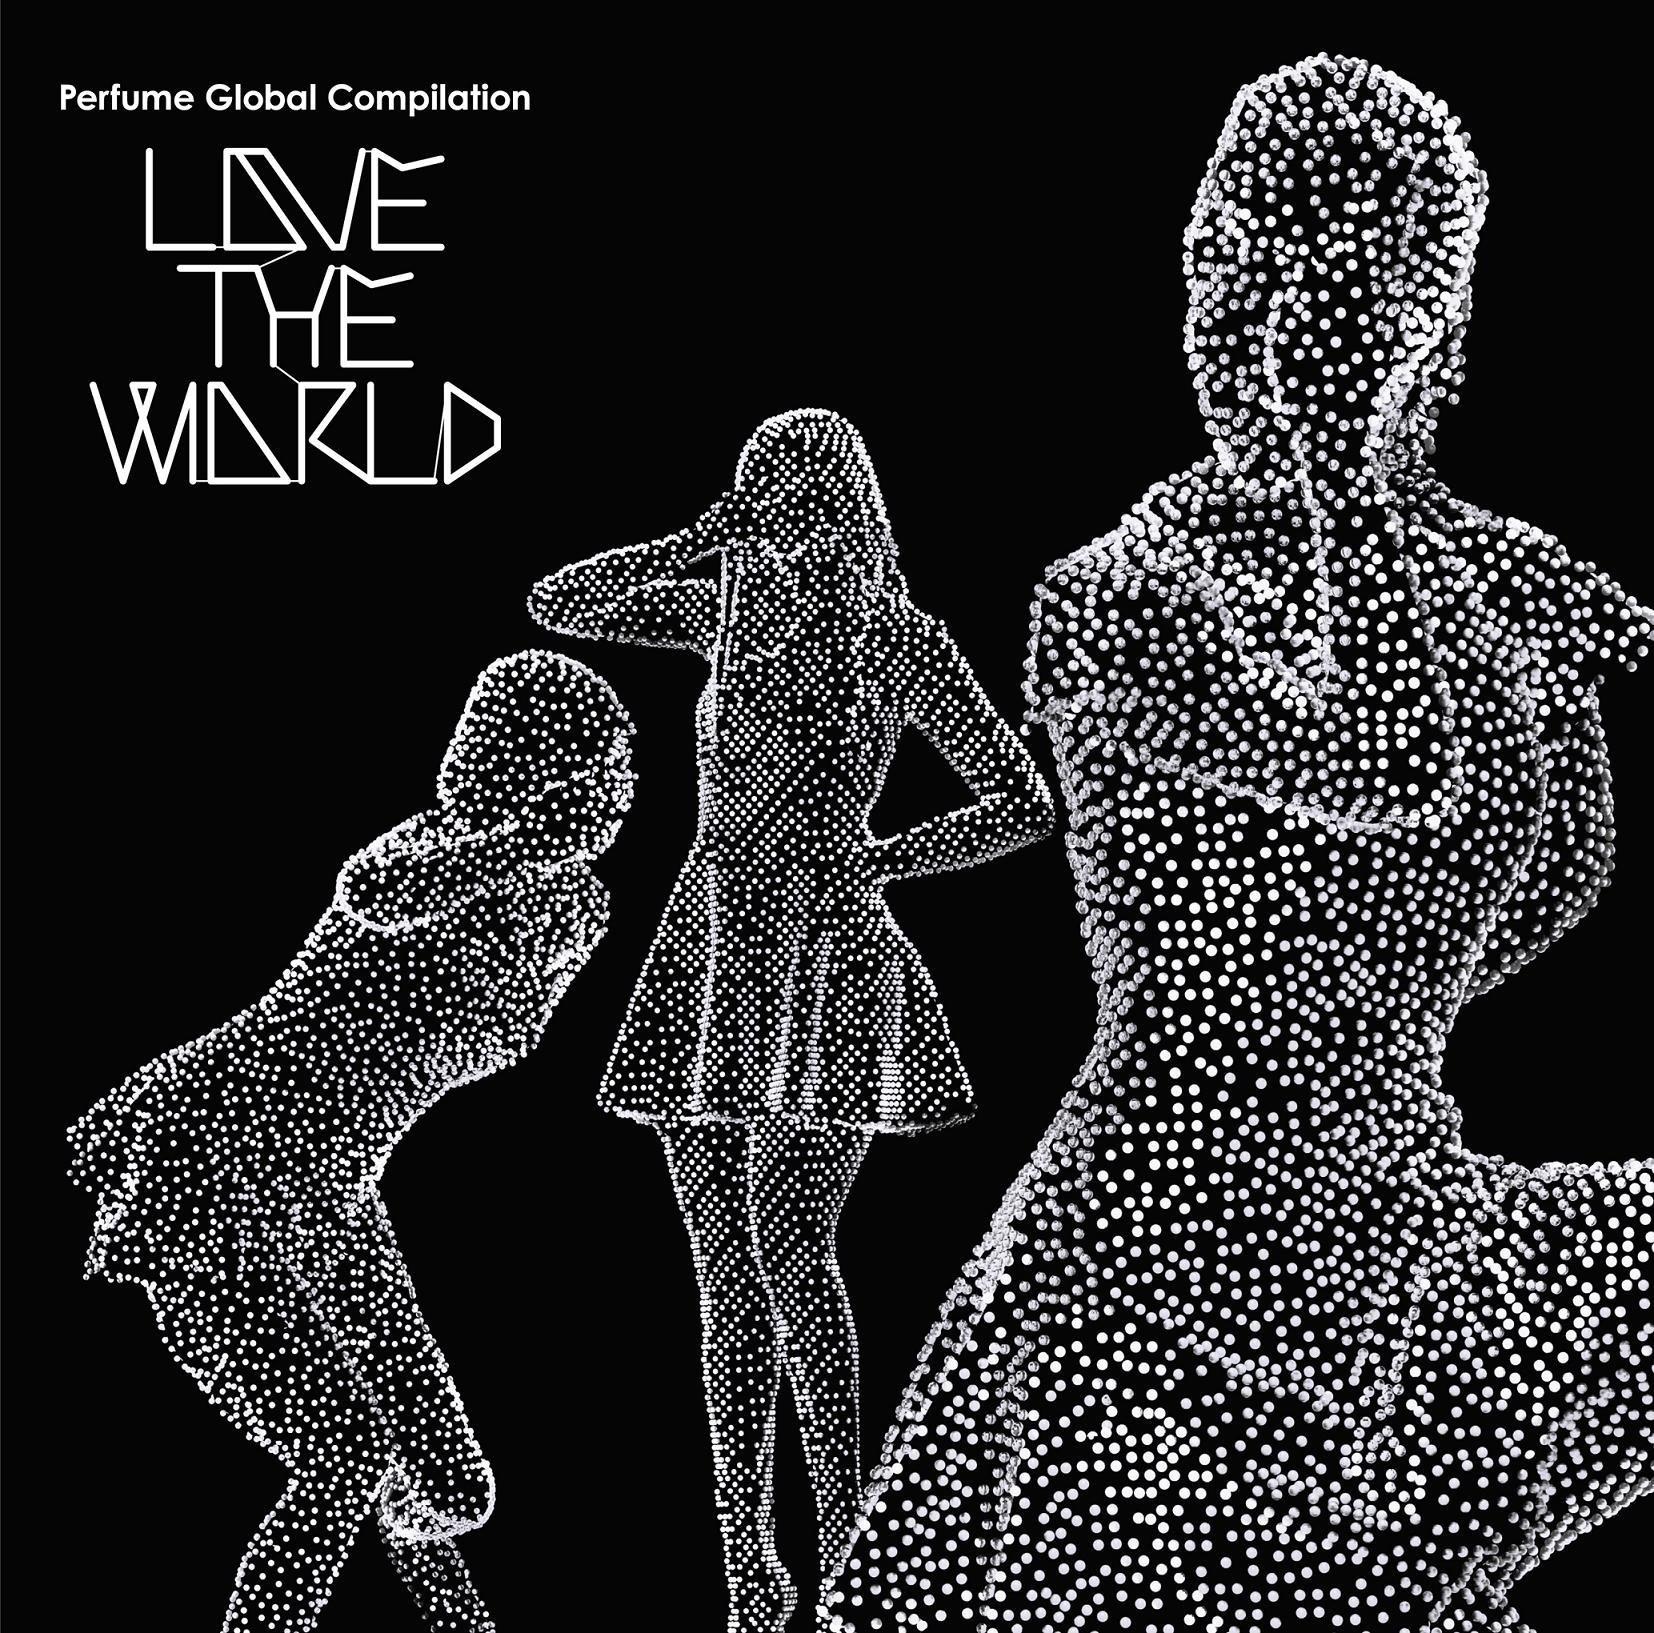 20170129.05.20 Perfume - Perfume Global Compilation ~Love the World~ cover 2.jpg